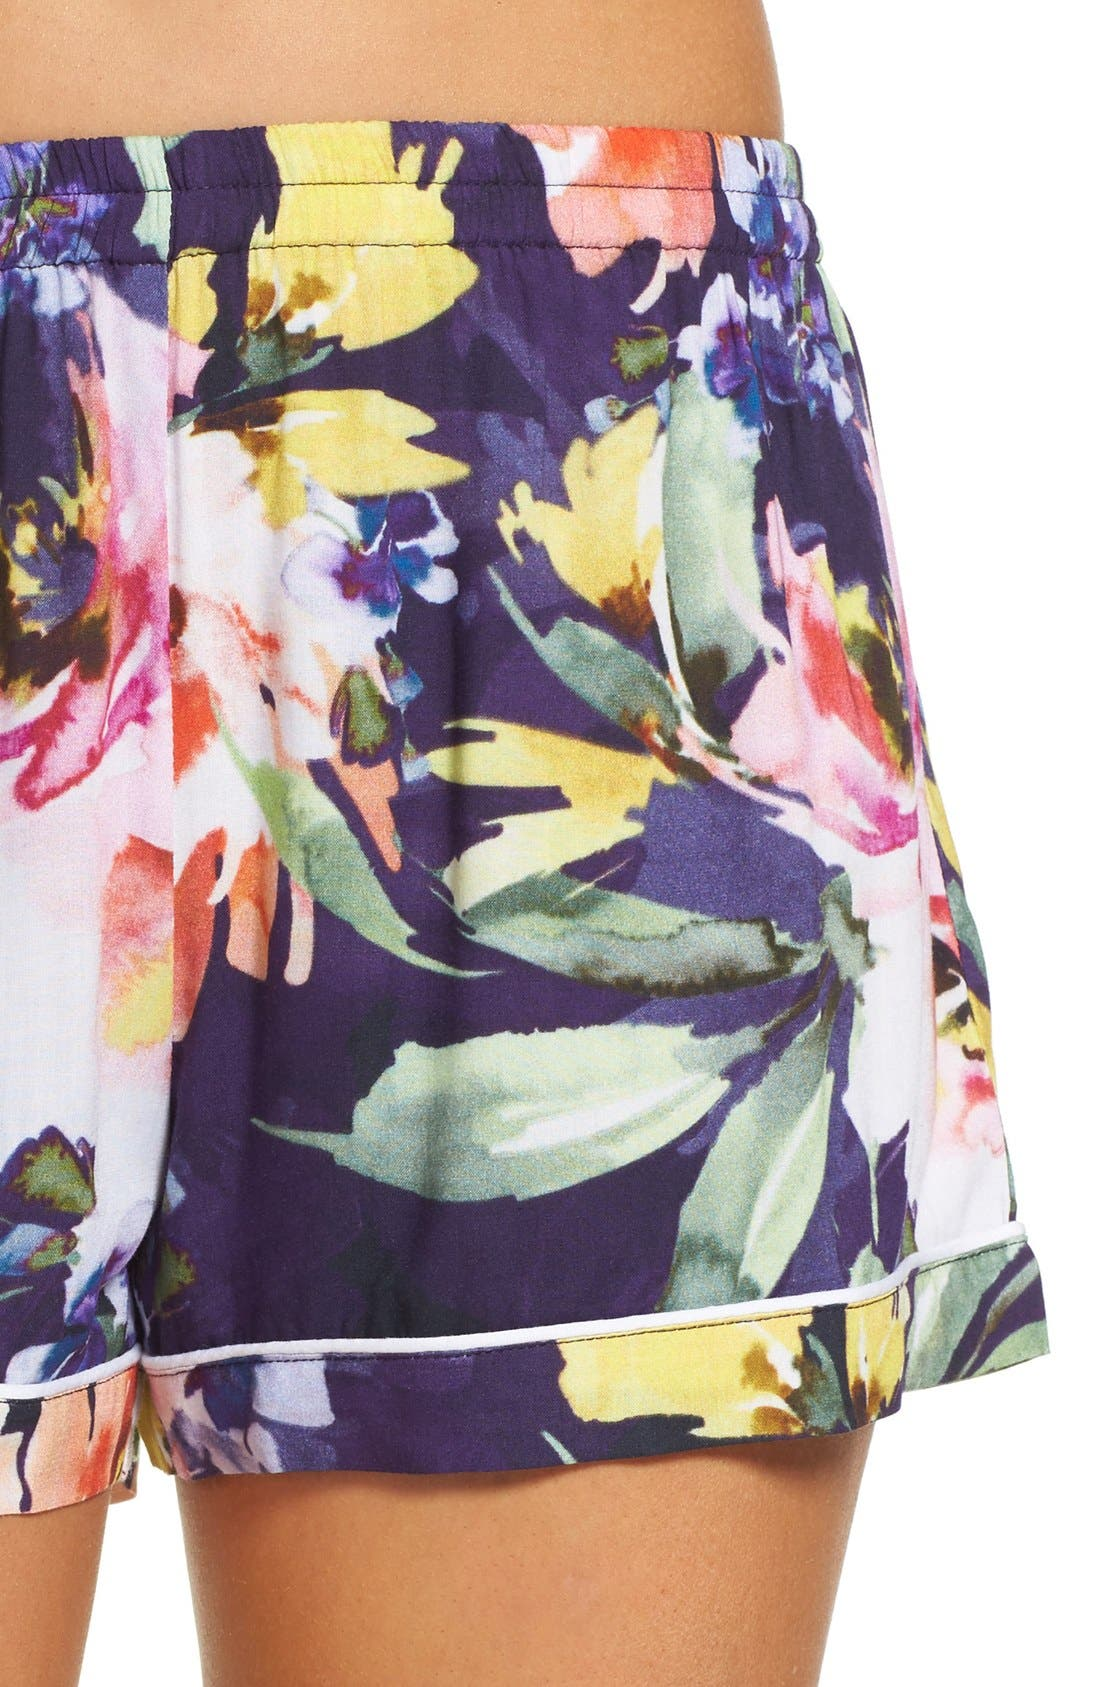 Zephyr Short Pajamas,                             Alternate thumbnail 2, color,                             400